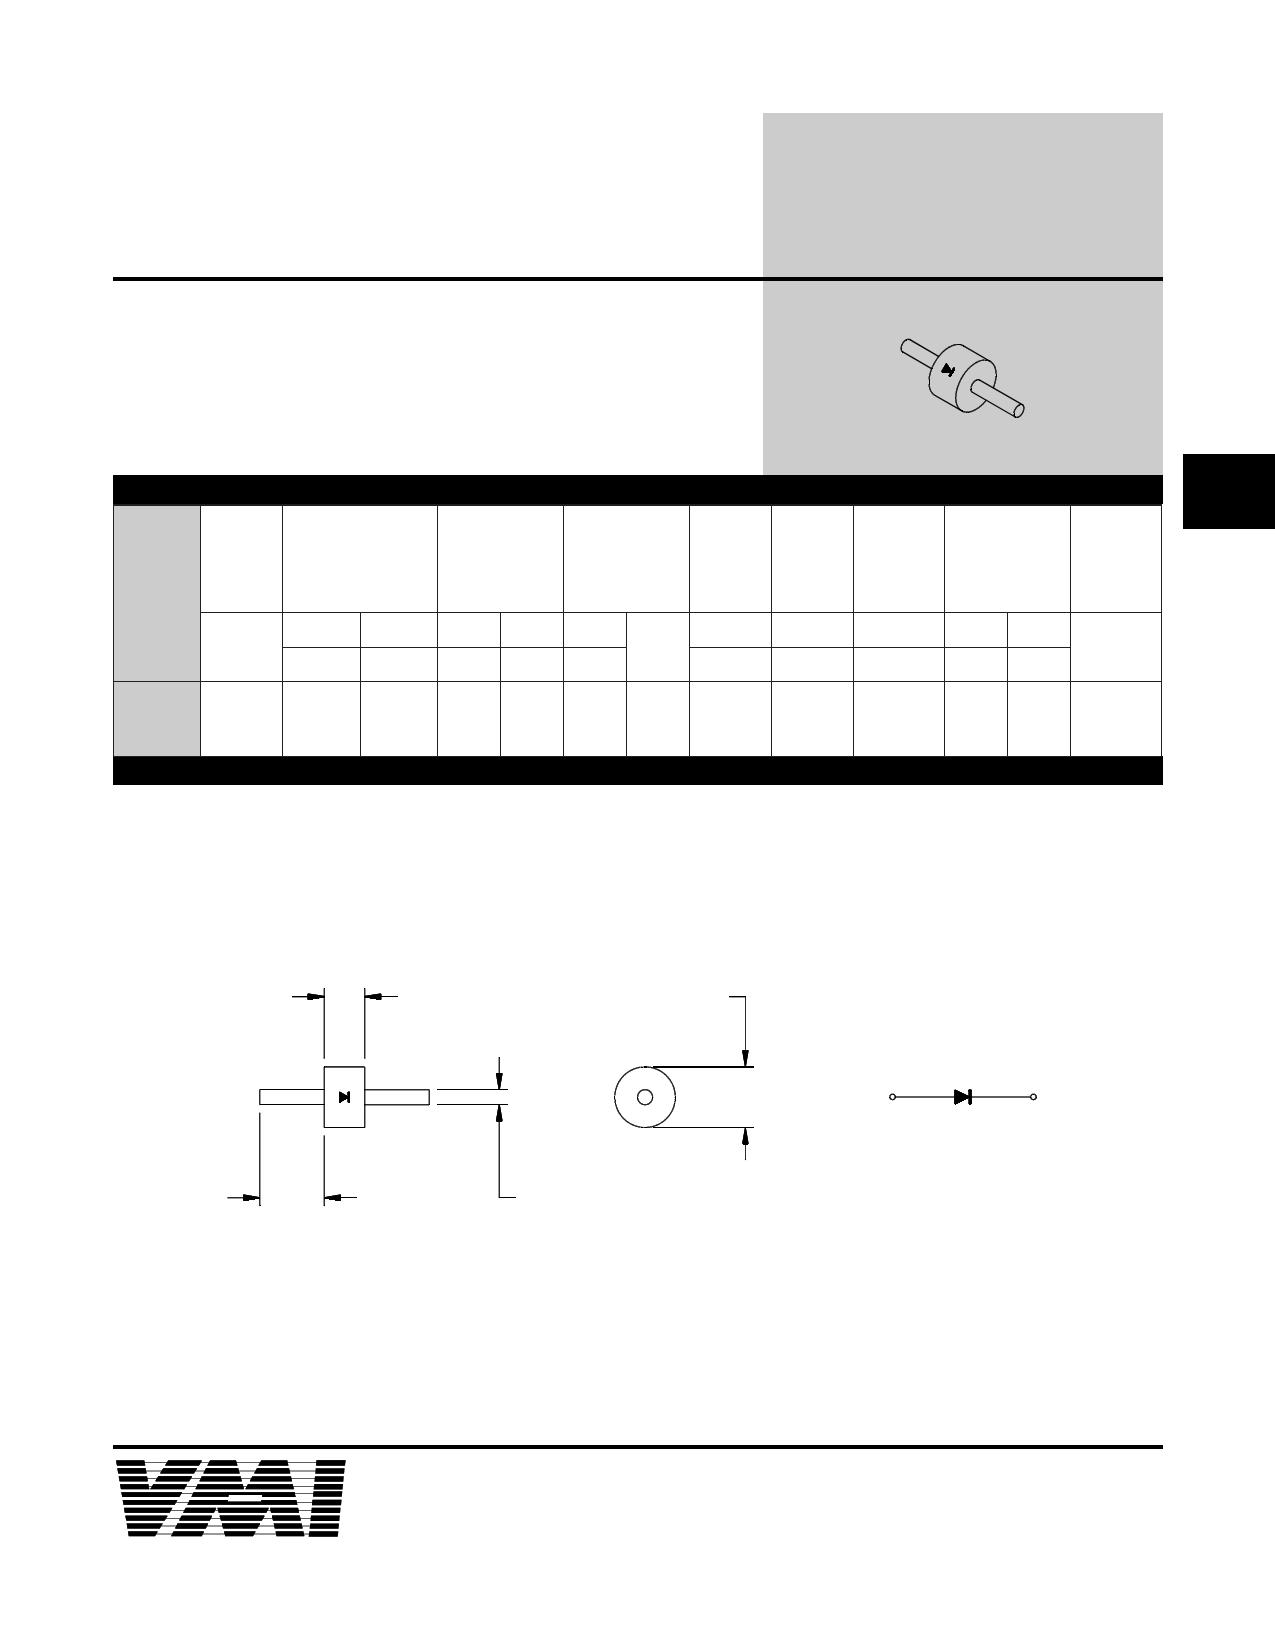 K100F datasheet